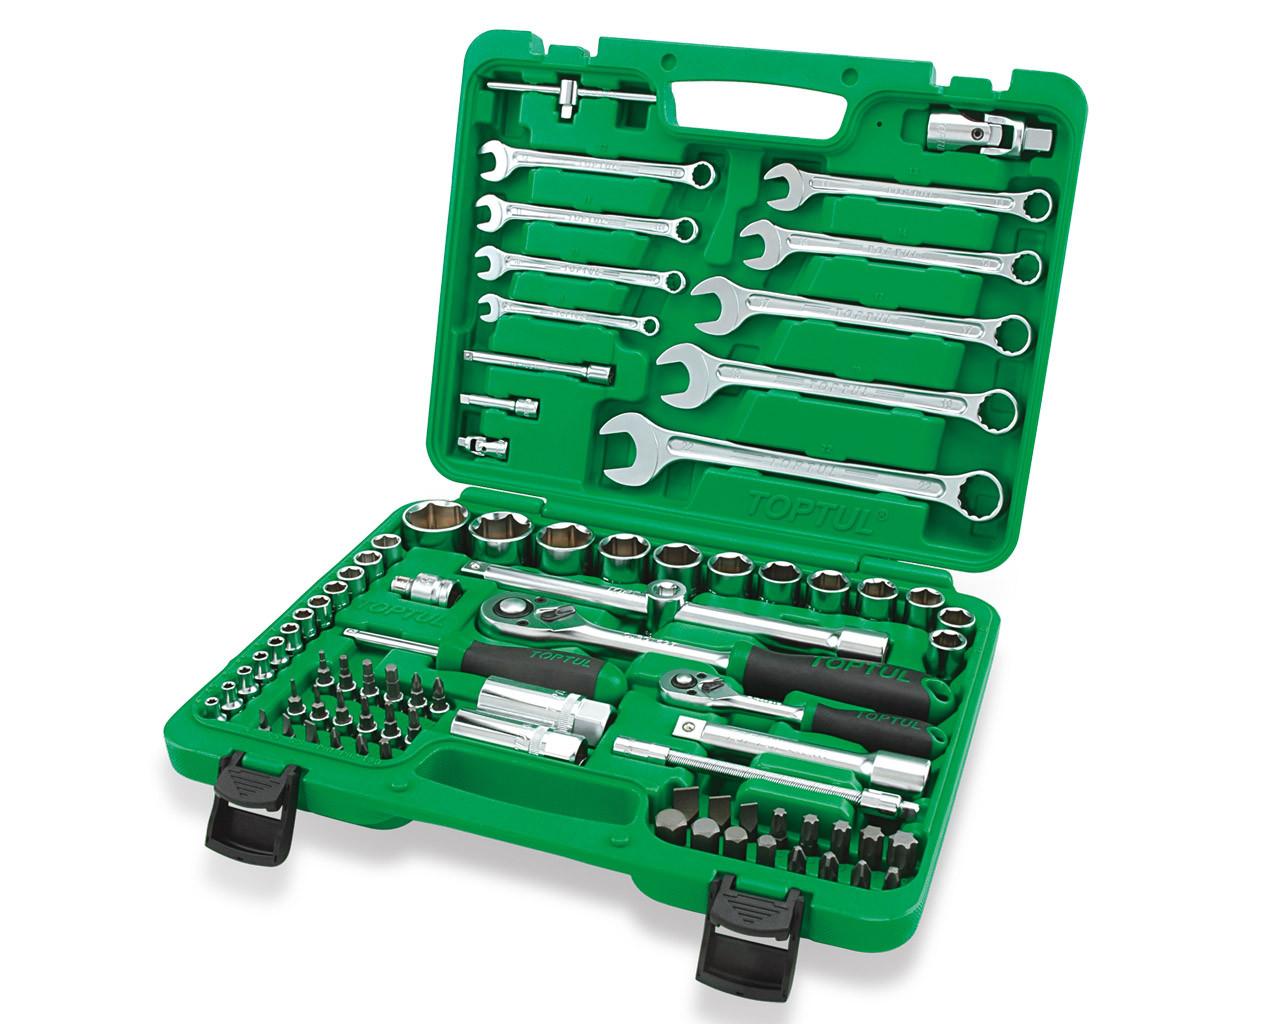 82a41184794 Toptul GCAI8201 Professional Grade Flank Socket Spanner Set 6PT 1 4